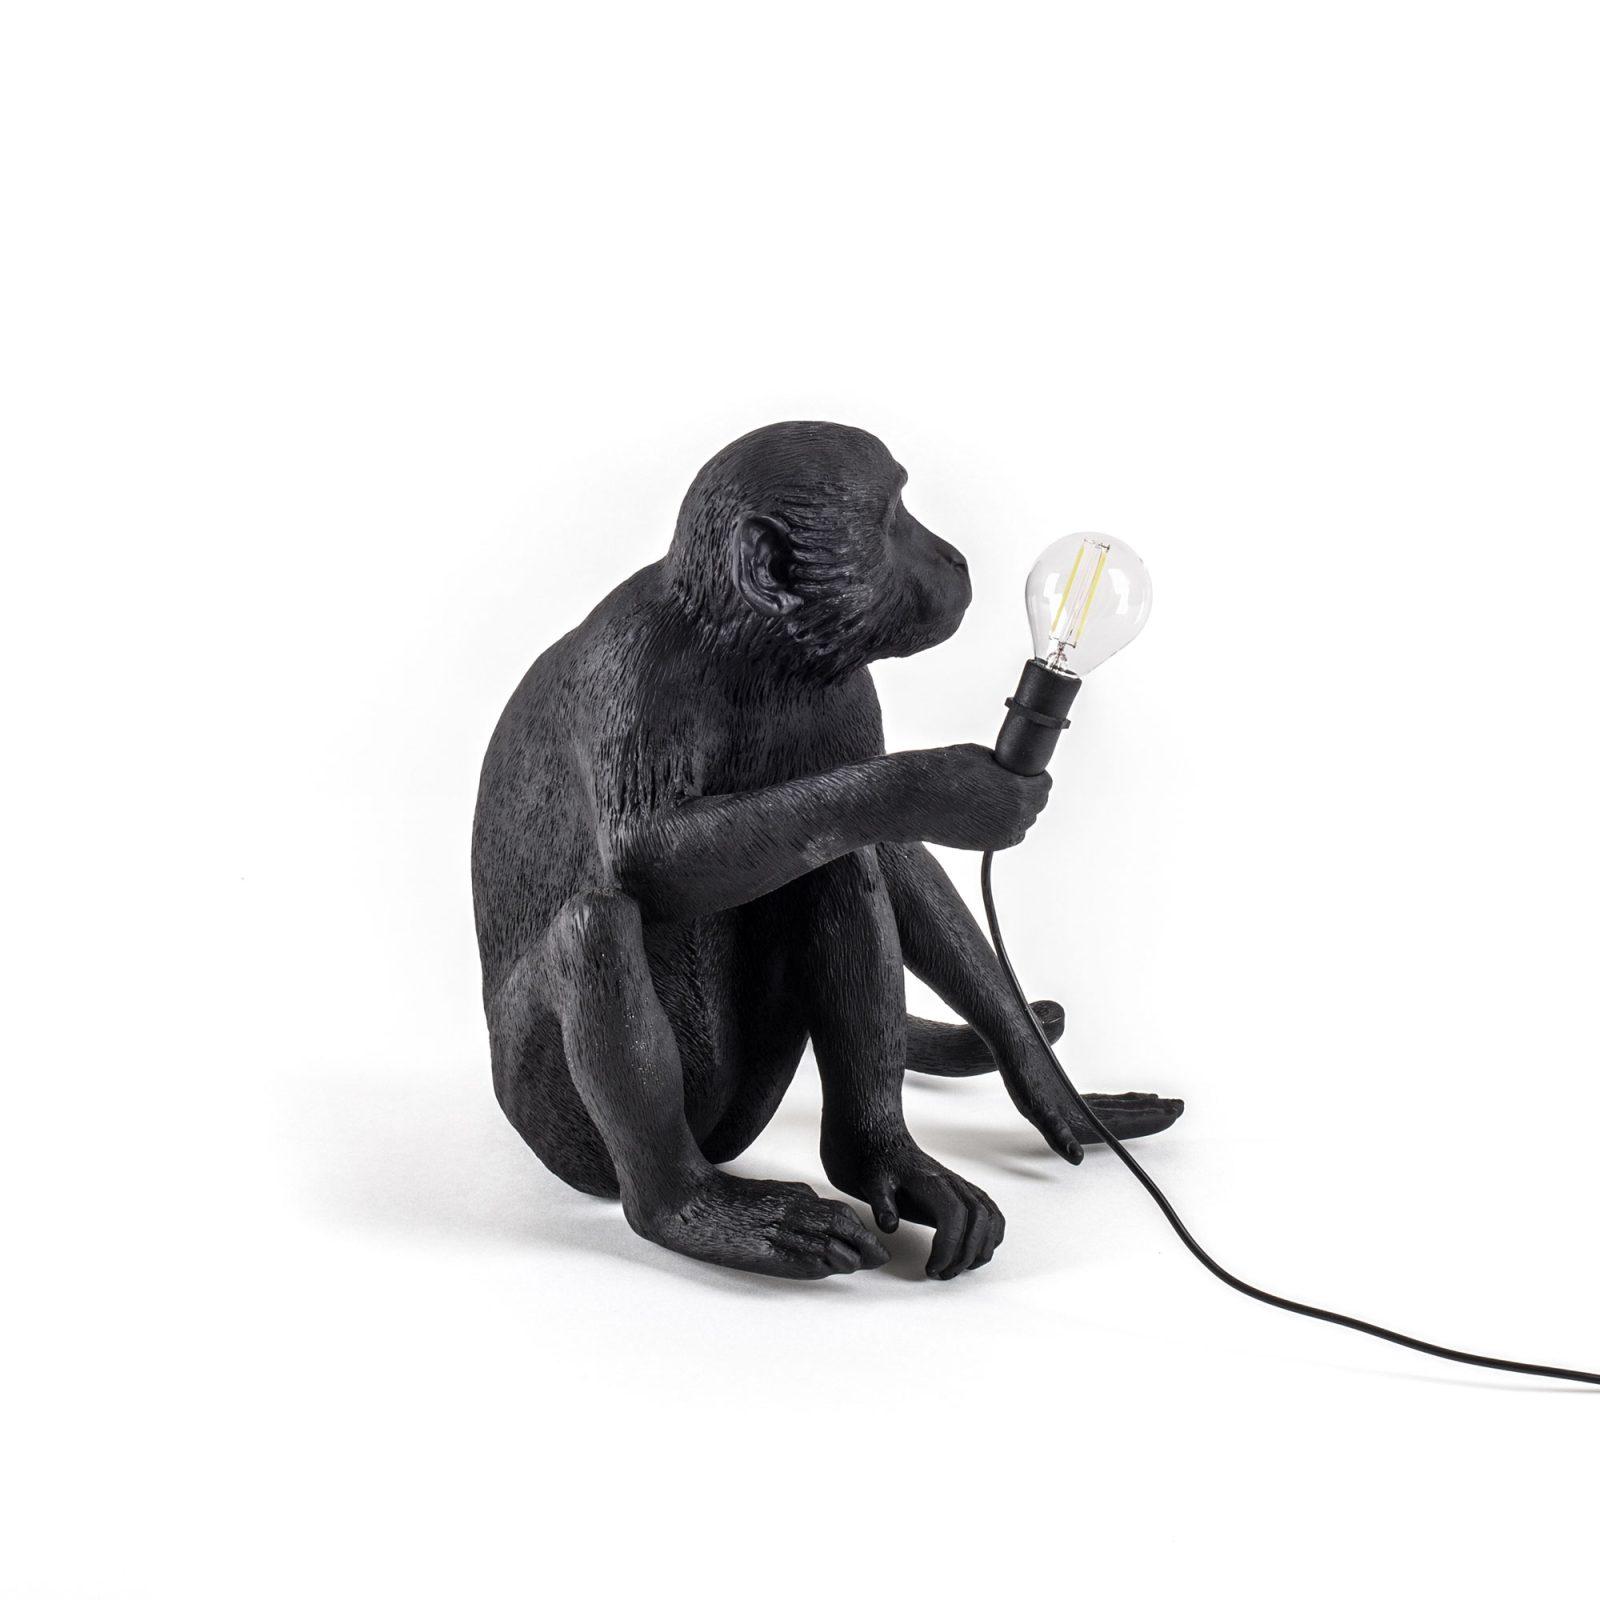 Seletti Outdoor Monkey Lamp, Sitting -31196